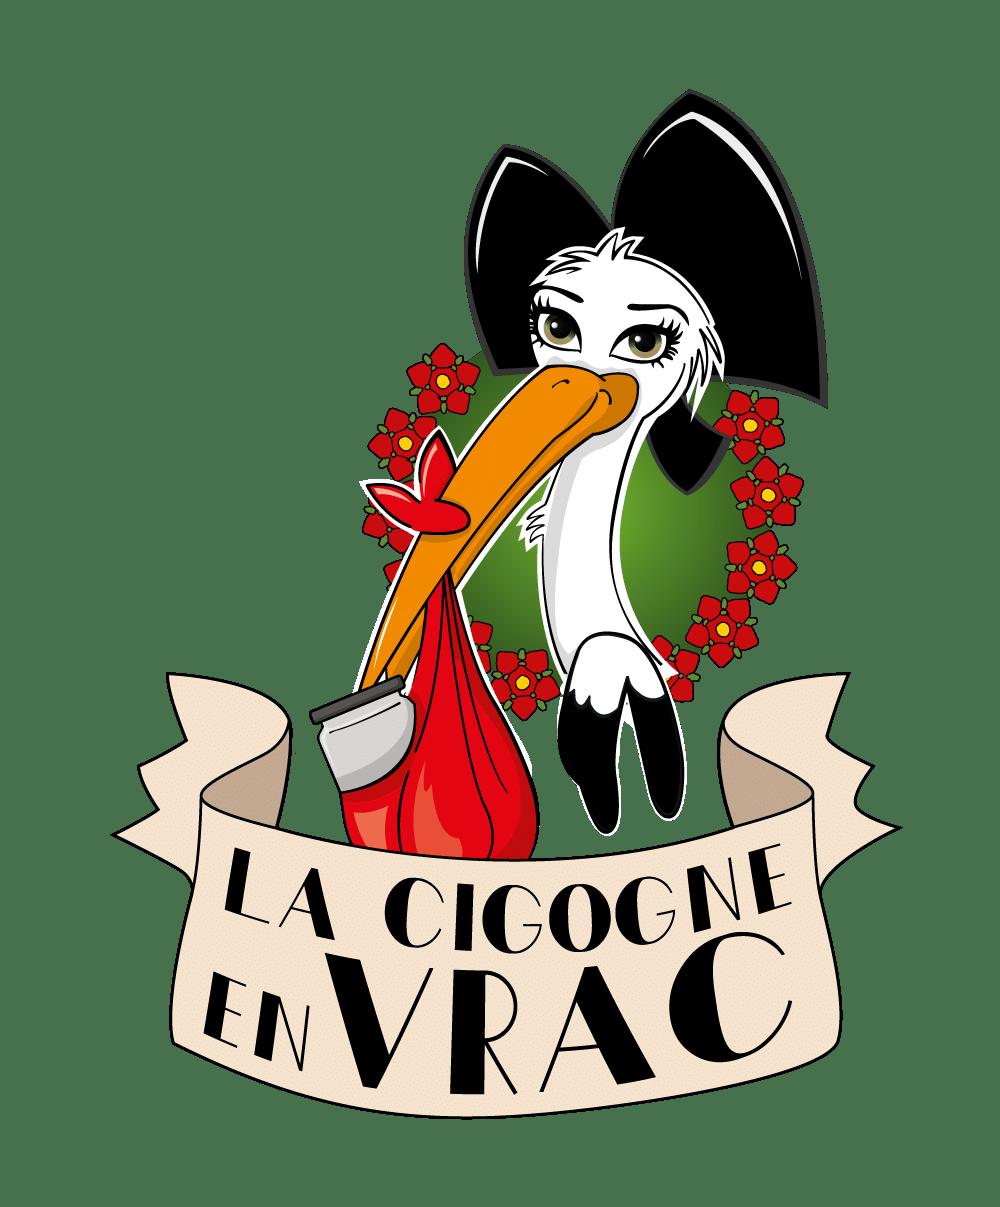 La Cigogne en Vrac